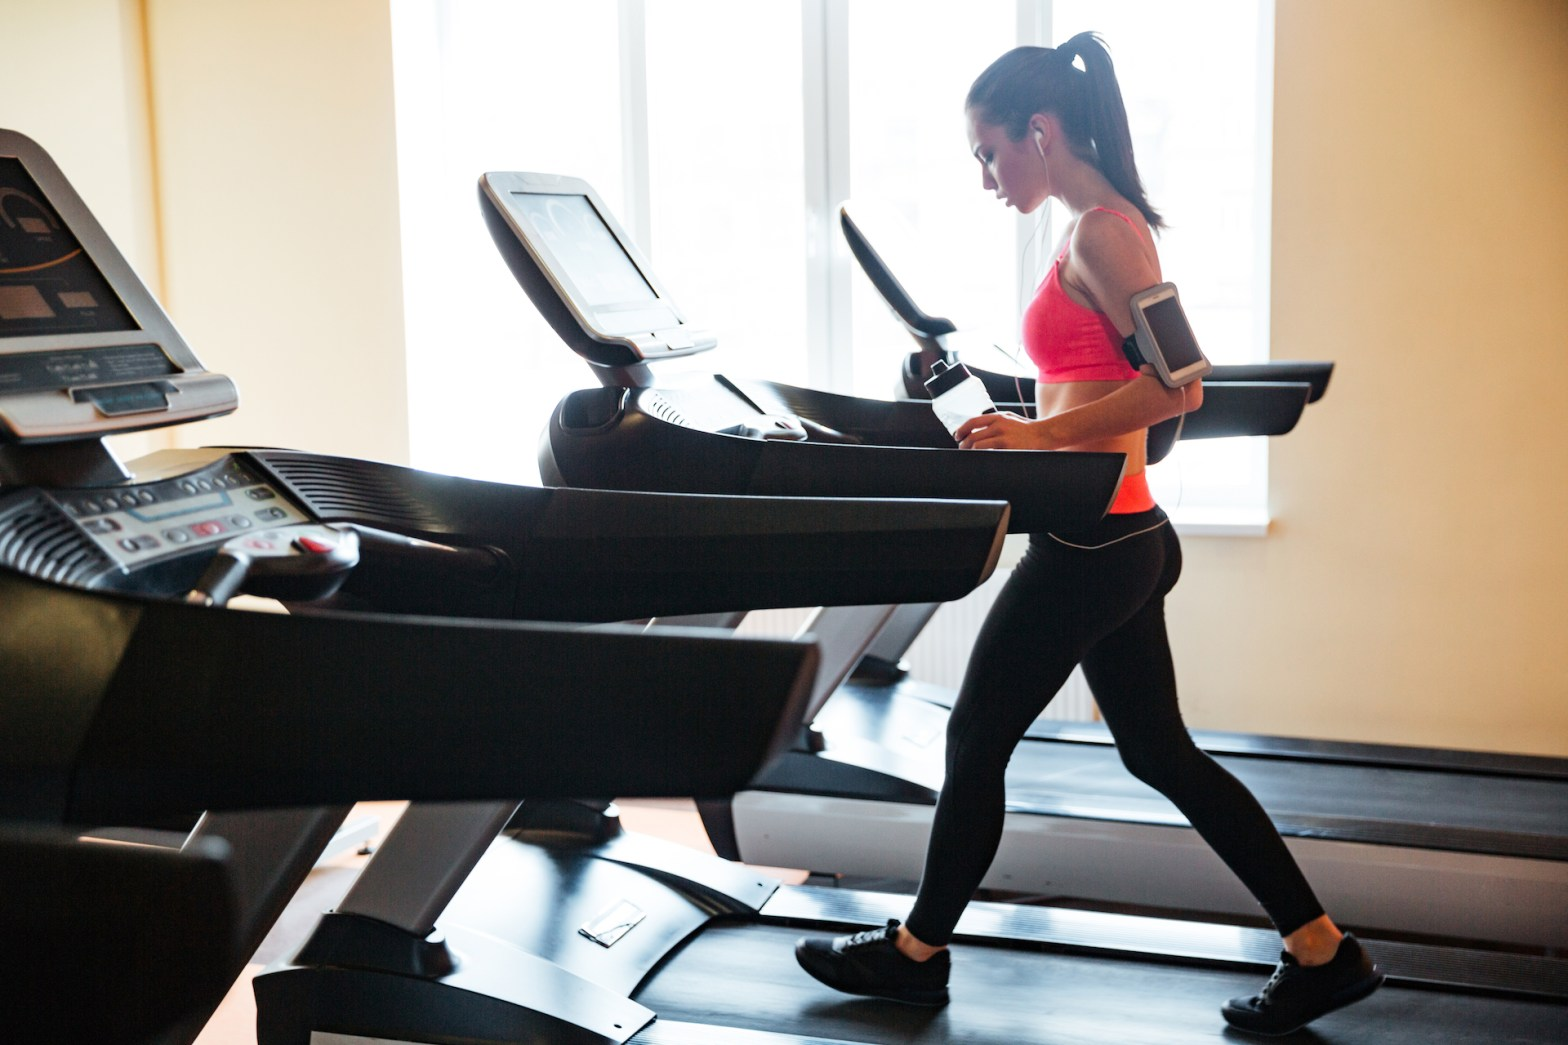 Sportswoman with earphones and blank screen smartphone using treadmill